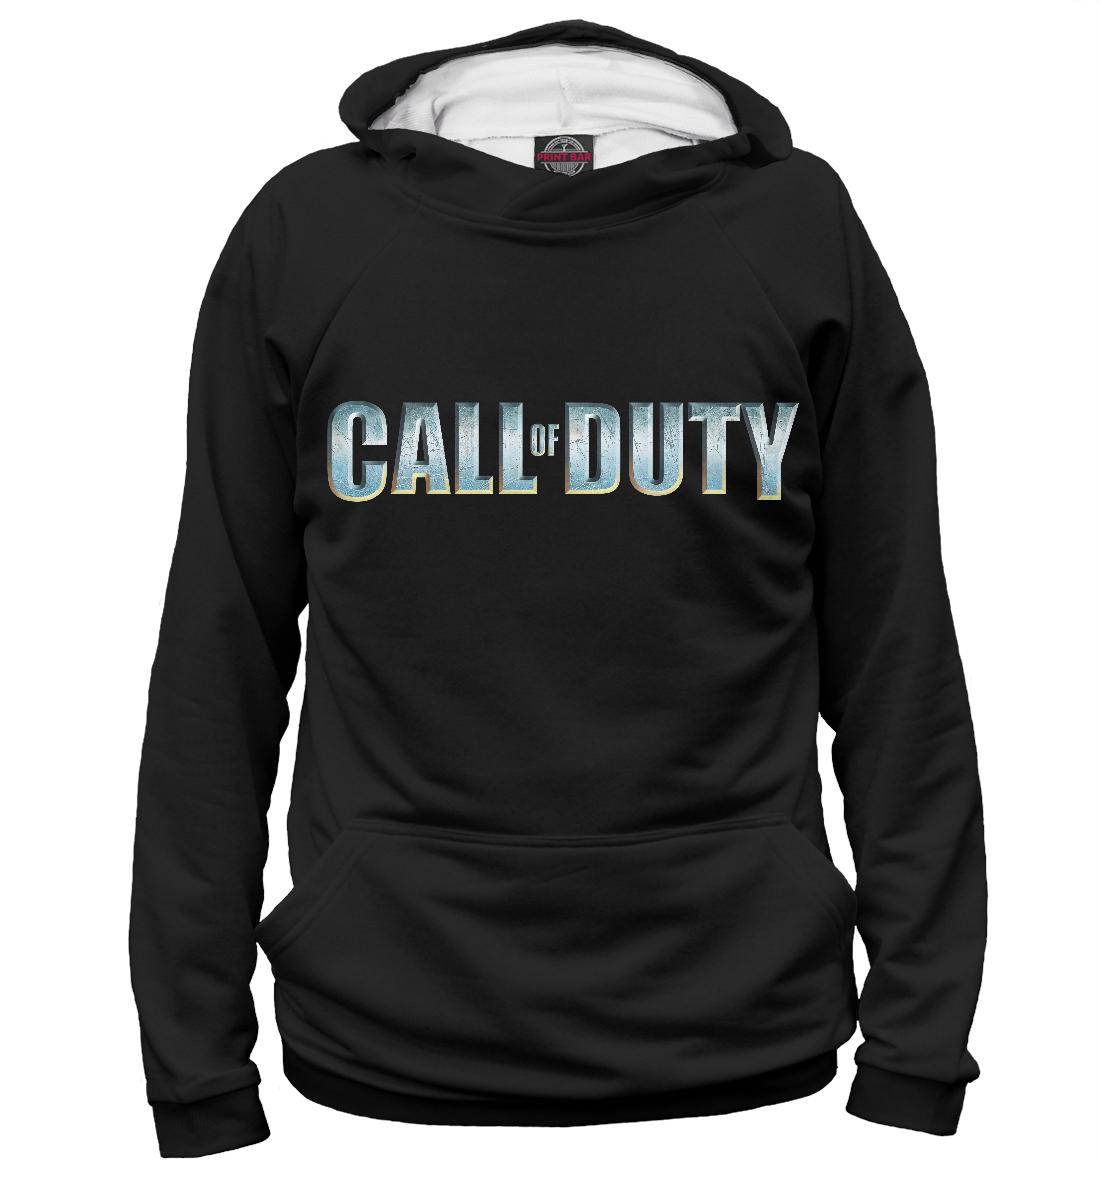 Купить Call of Duty, Printbar, Худи, COD-422970-hud-2